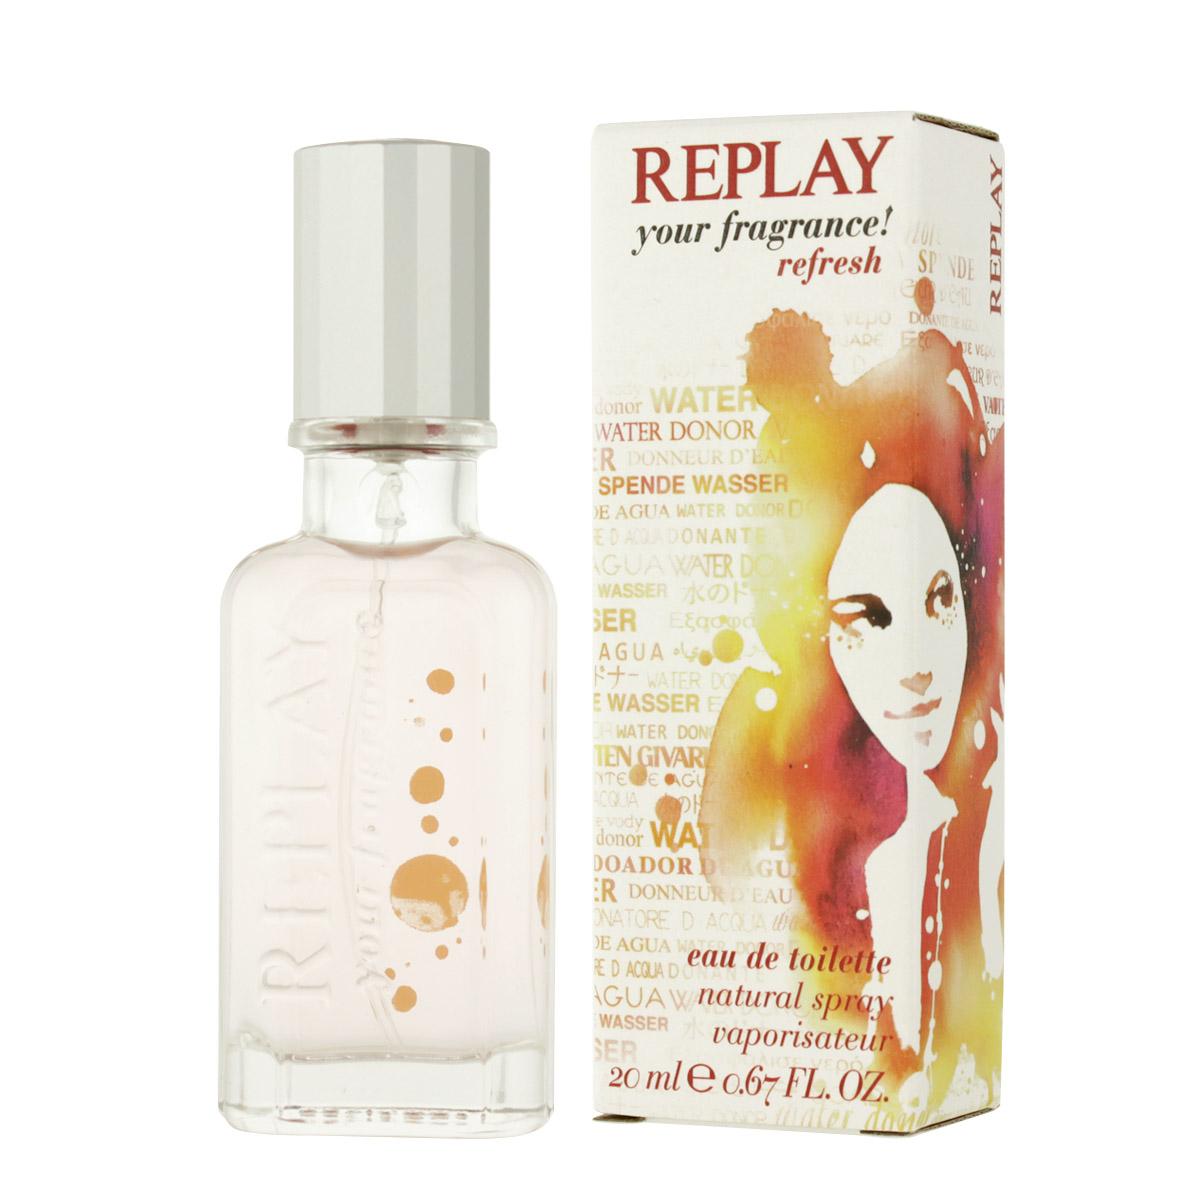 Replay Your Fragrance Refresh Woman, Toaletní voda, 20ml, Dámska vôňa, + AKCE: dárek zdarma